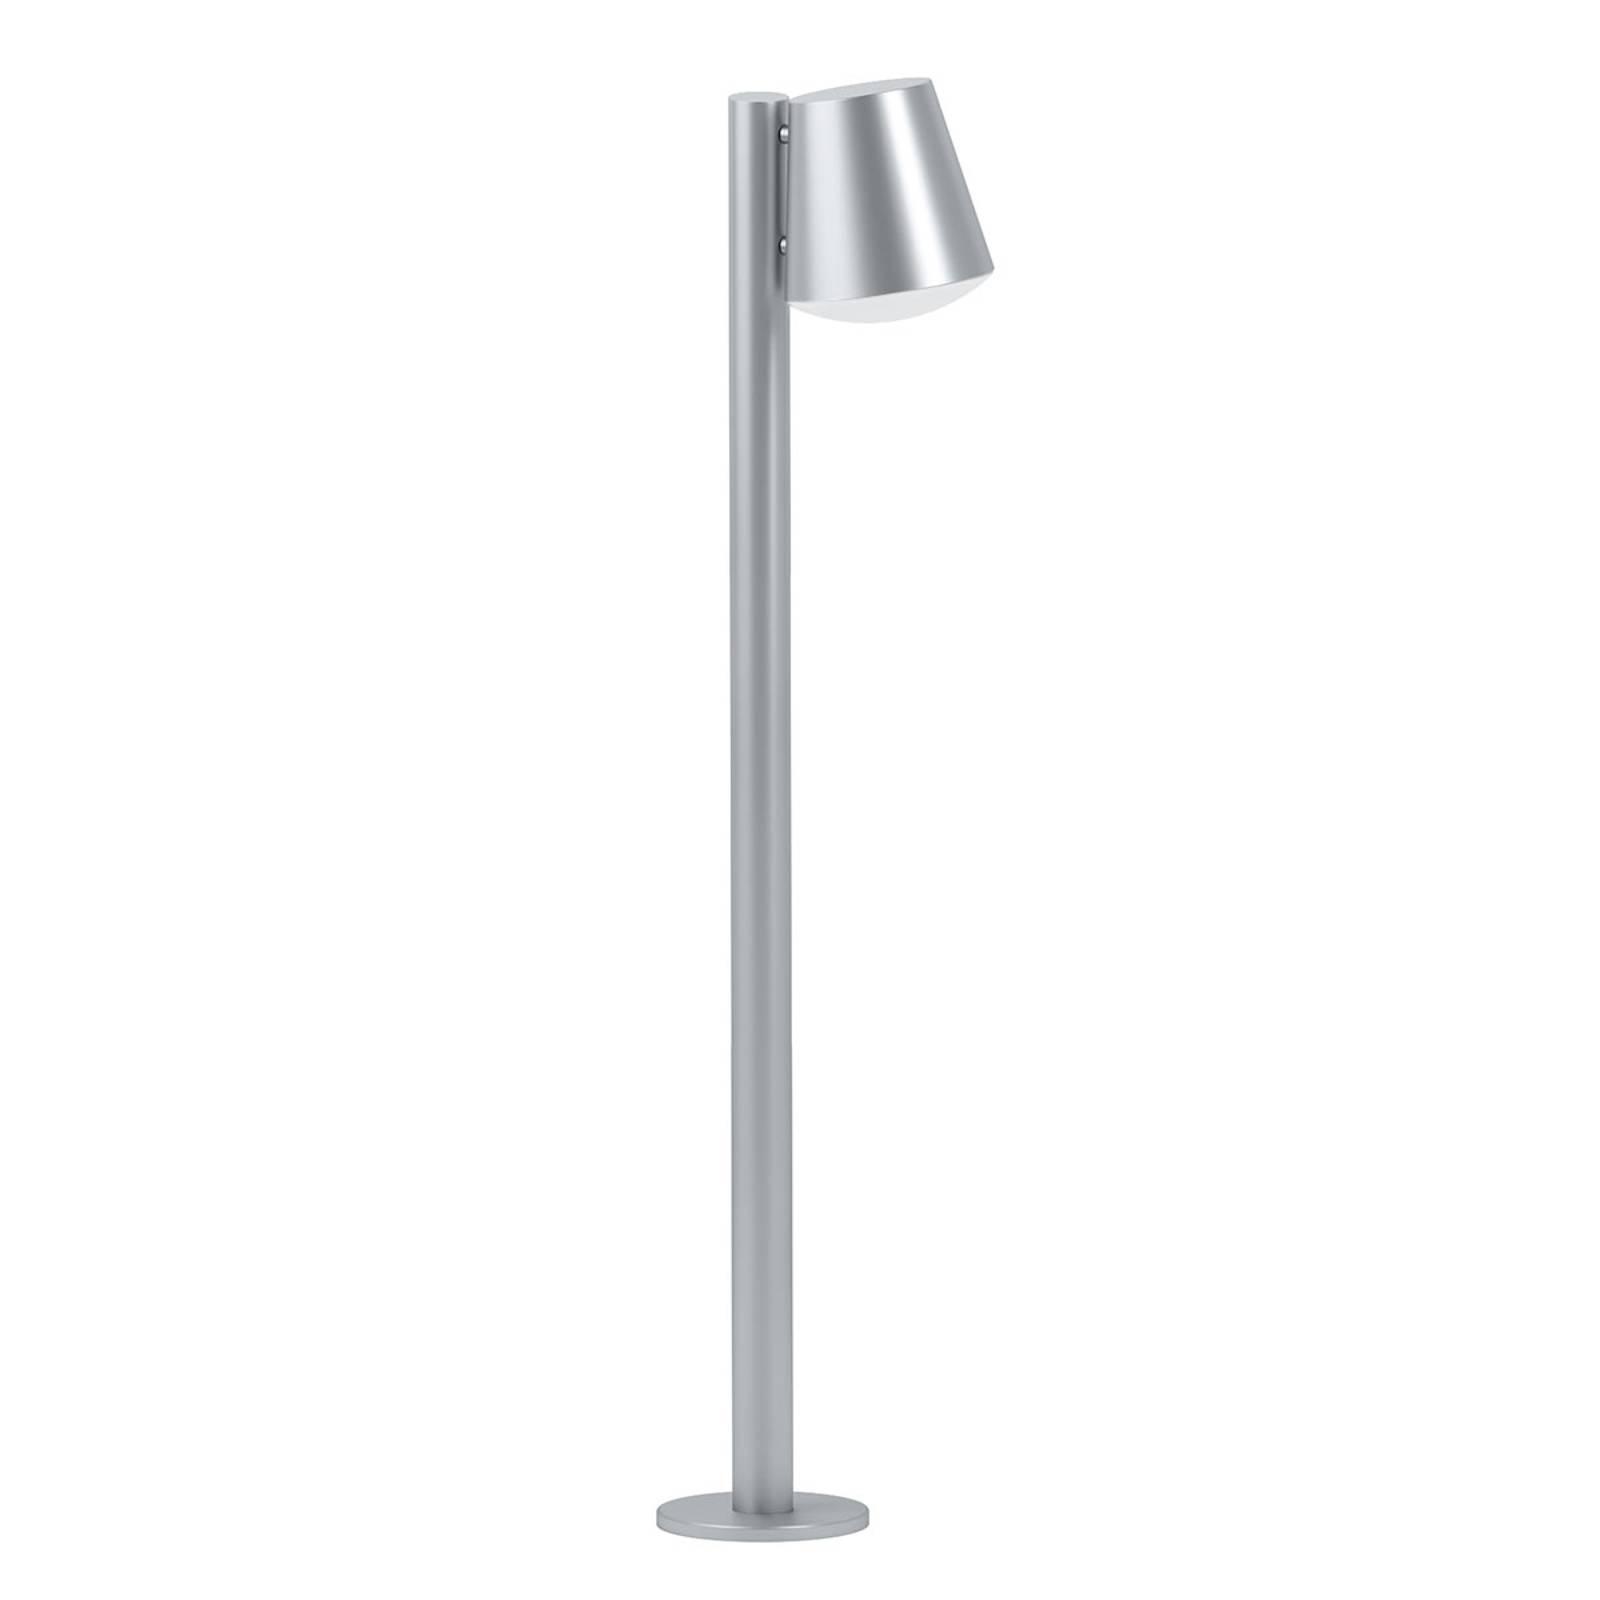 EGLO connect Caldiero-C LED tuinpadverlichting rvs